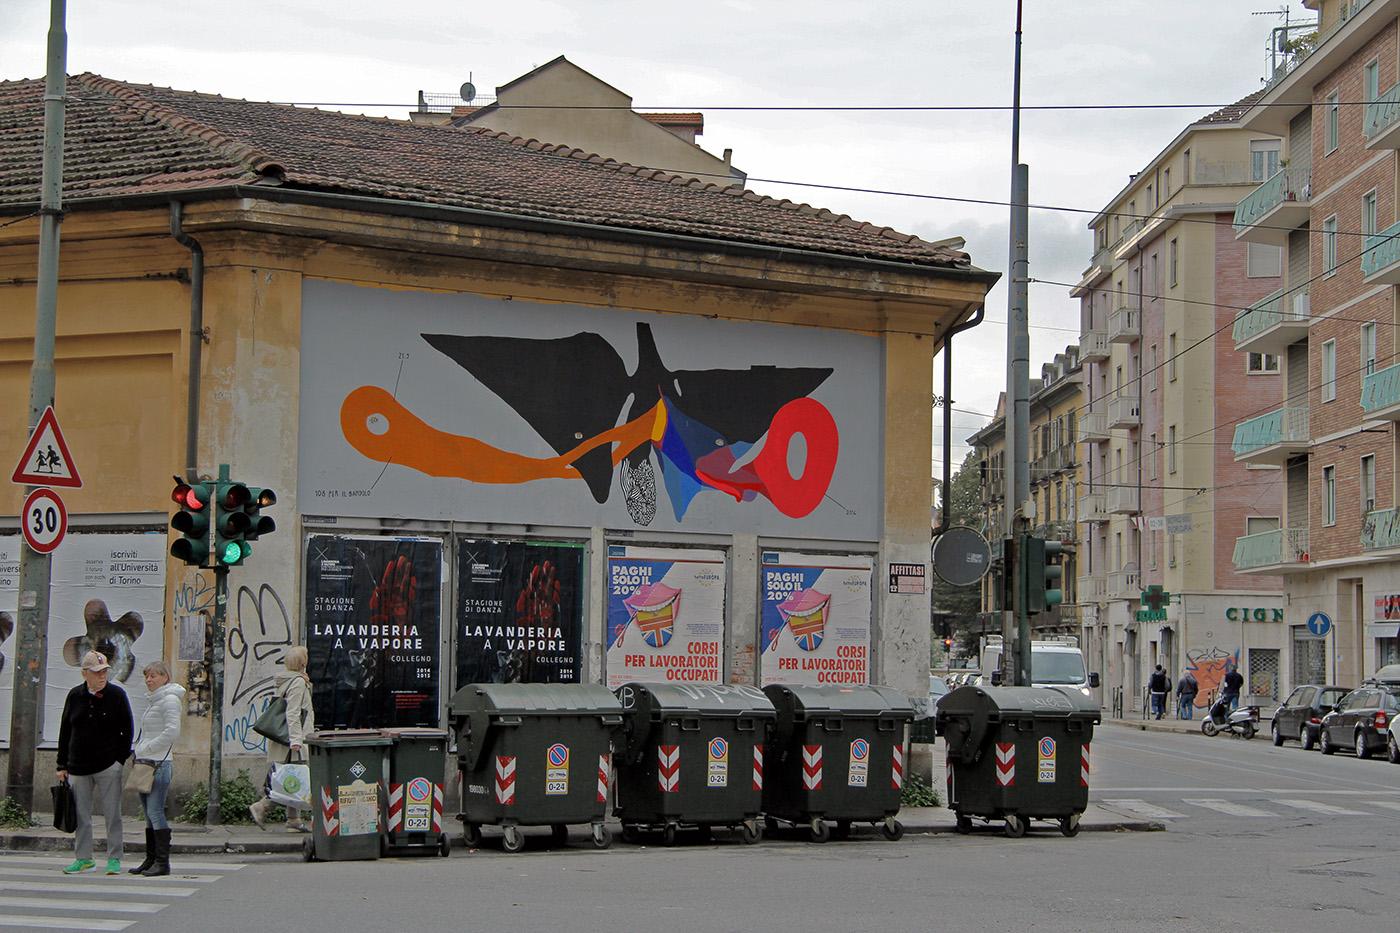 108-new-mural-in-torino-06